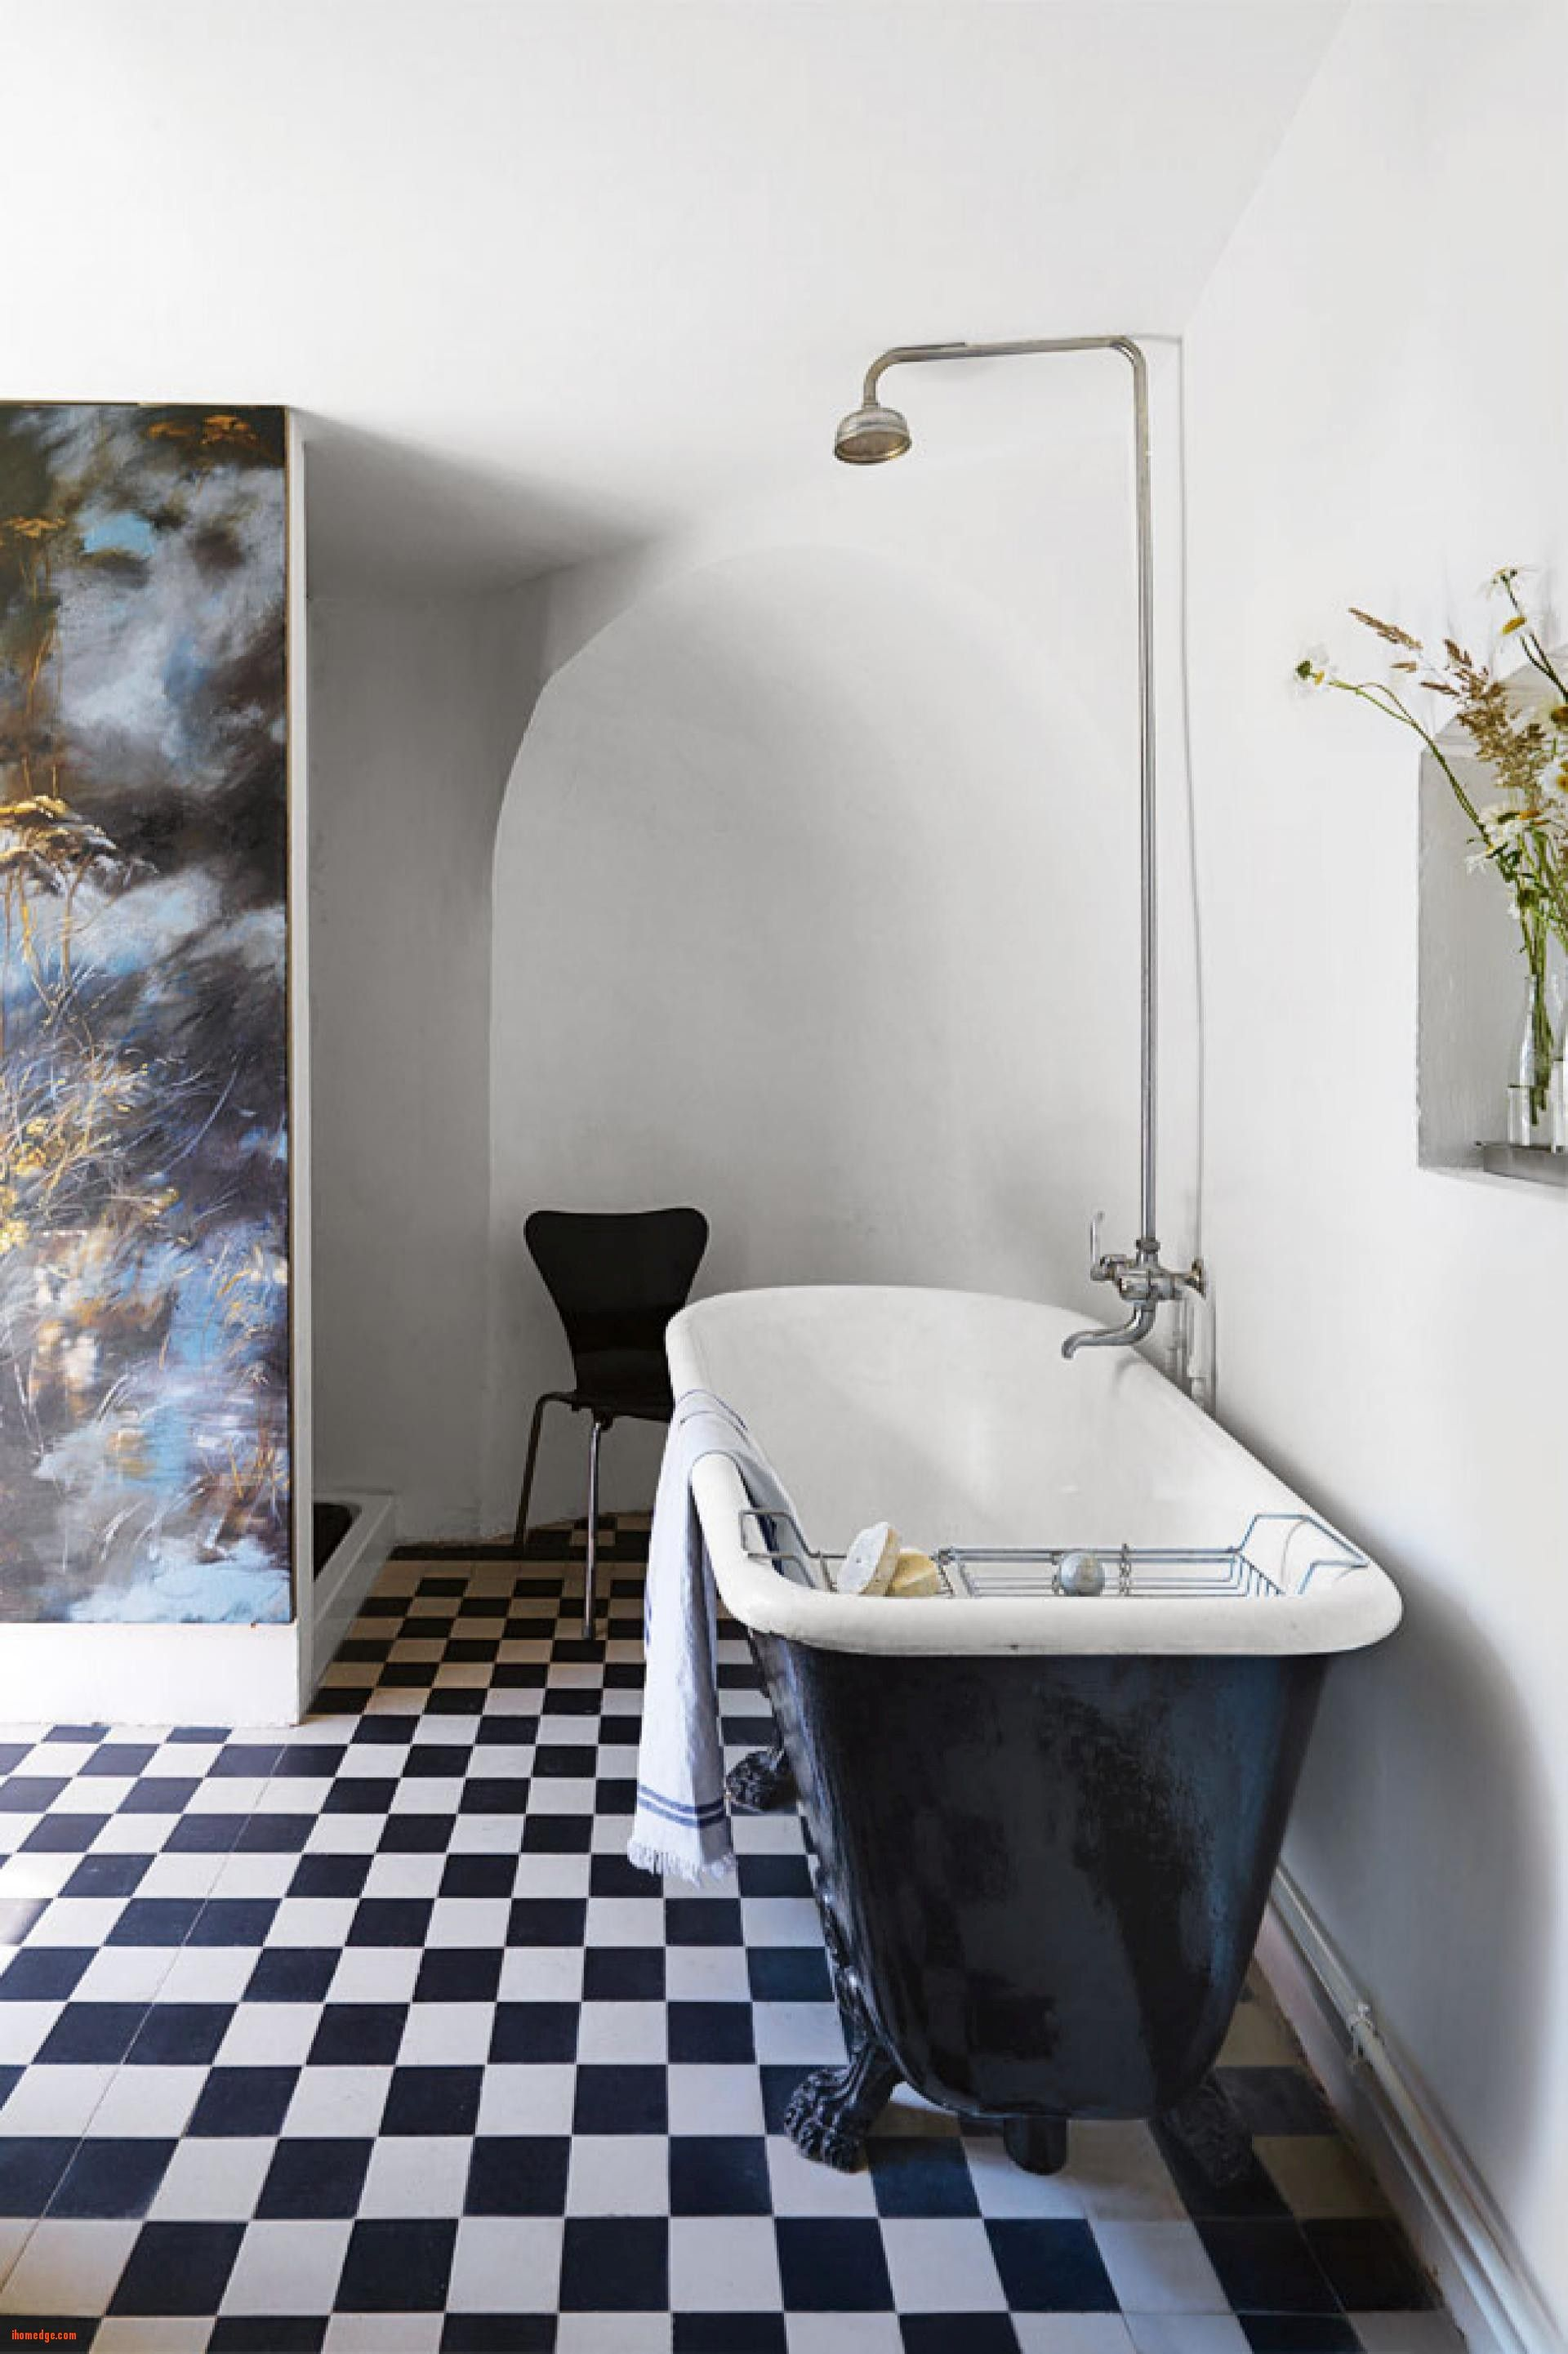 good Inspirational Bathroom In French bathroom black and white bath tub checkered floor french chateau